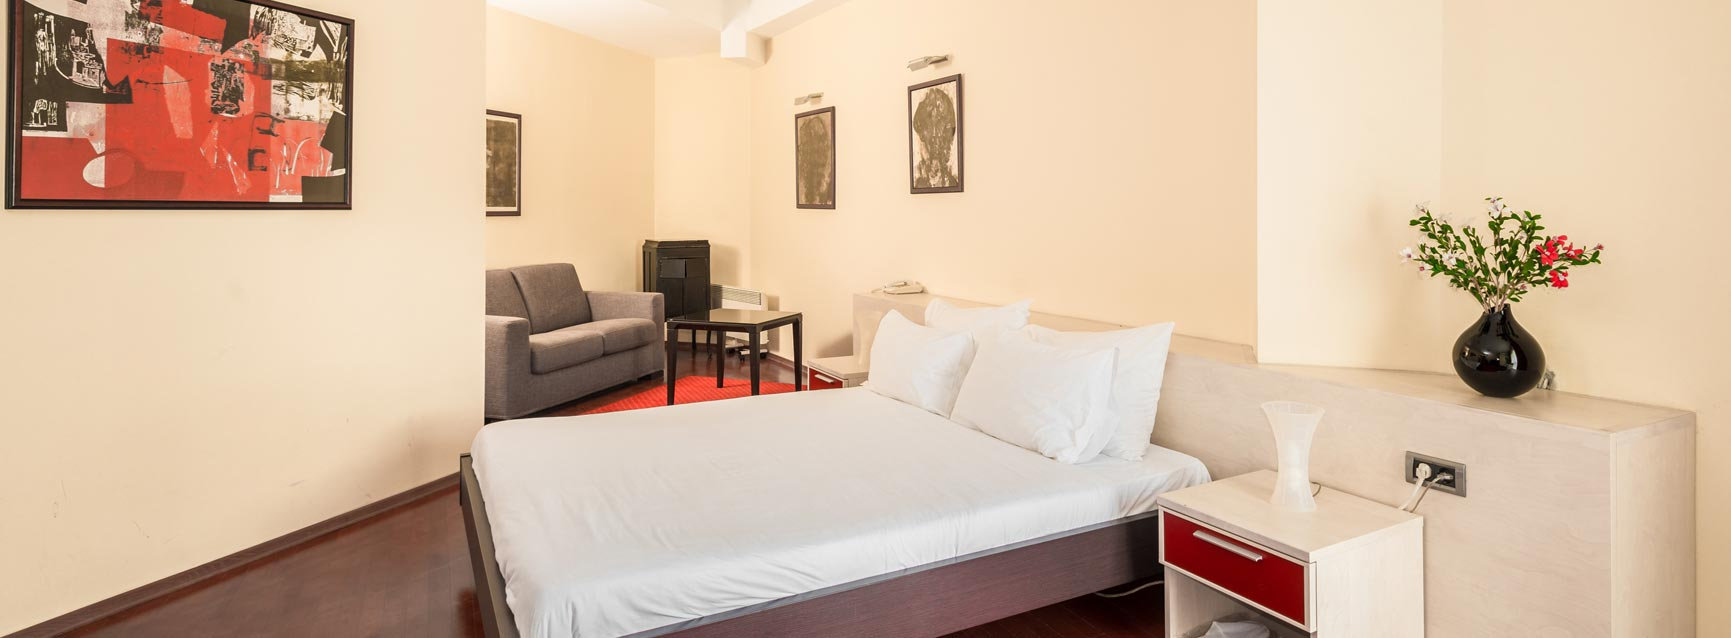 Pelister hotel room